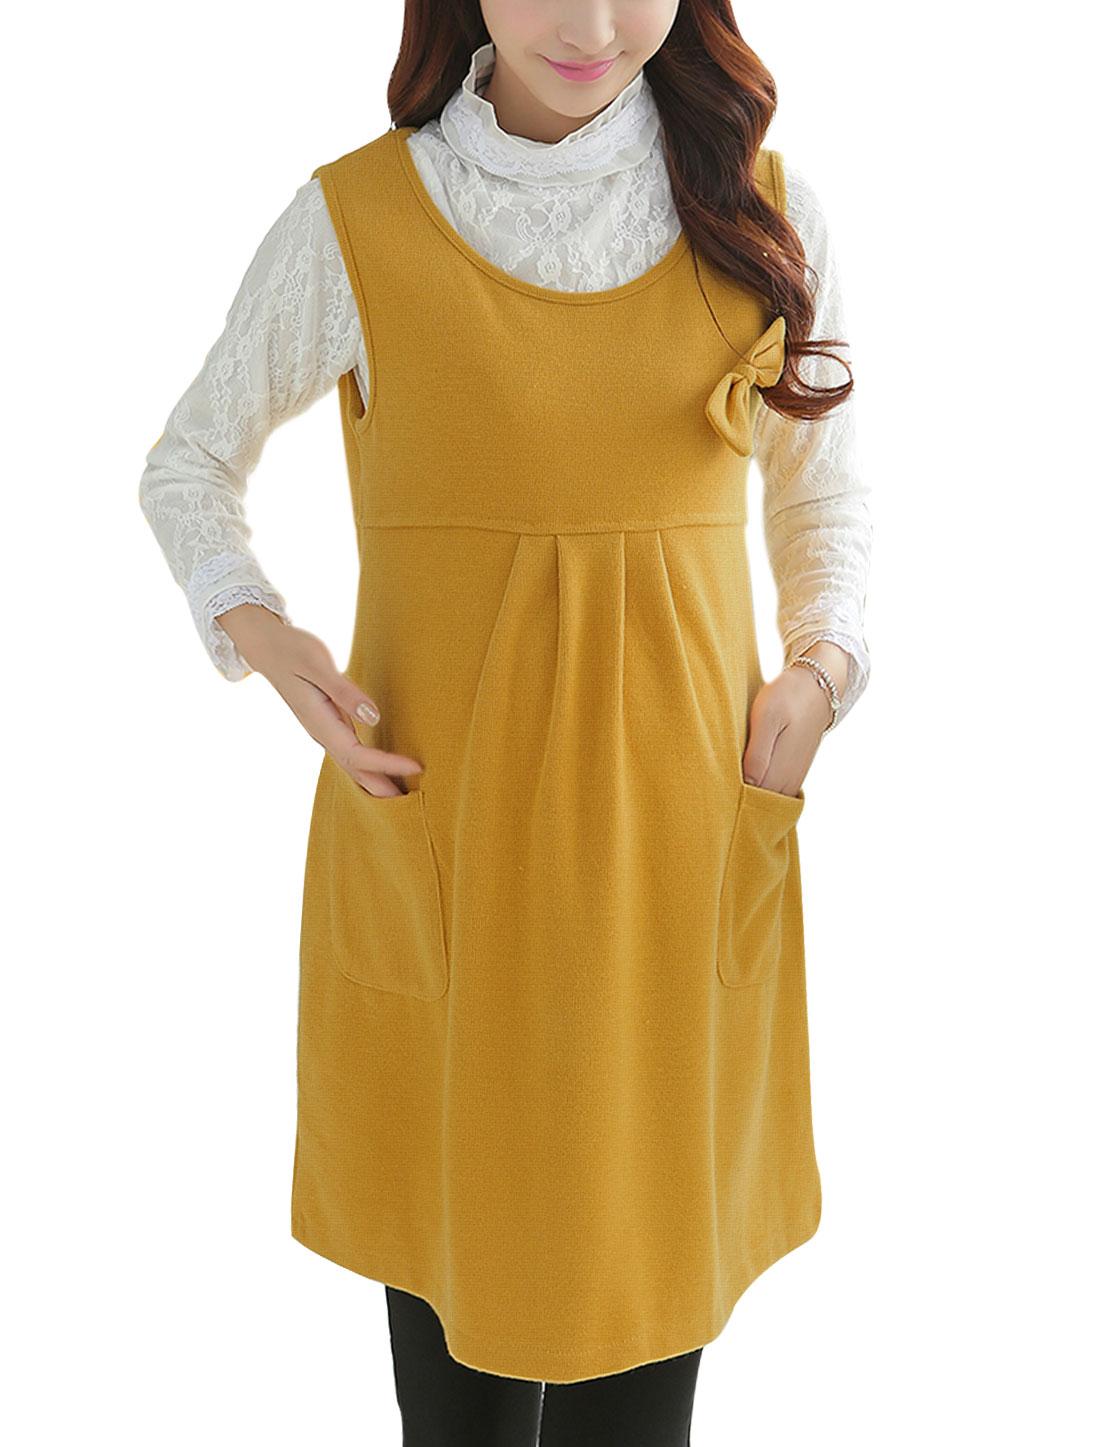 Pregnant Women Bowknot Decor Bust Leisure Short Dress Yellow M